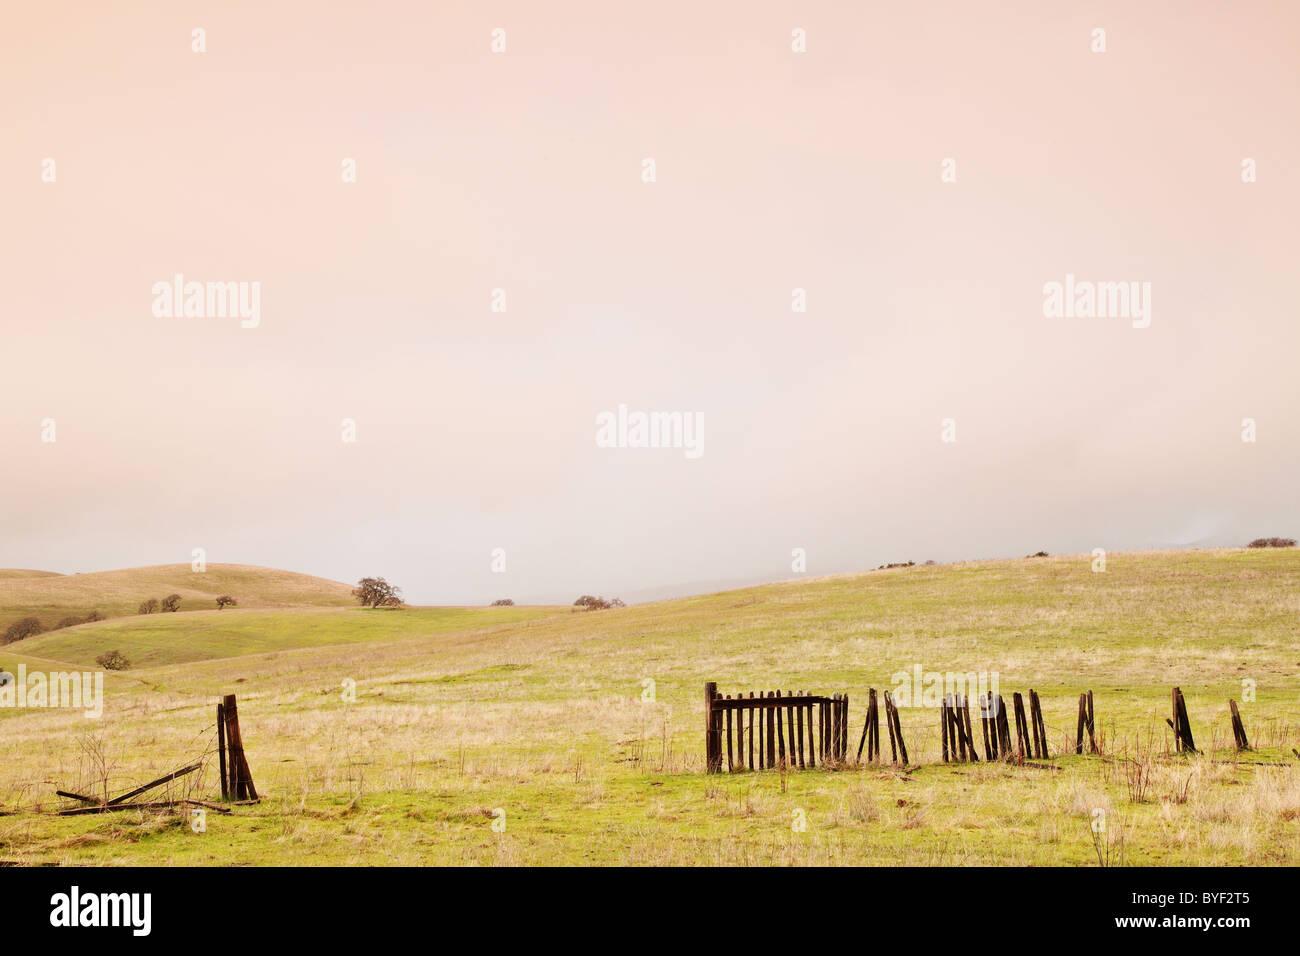 A broken farm fence opens into farmland - Stock Image